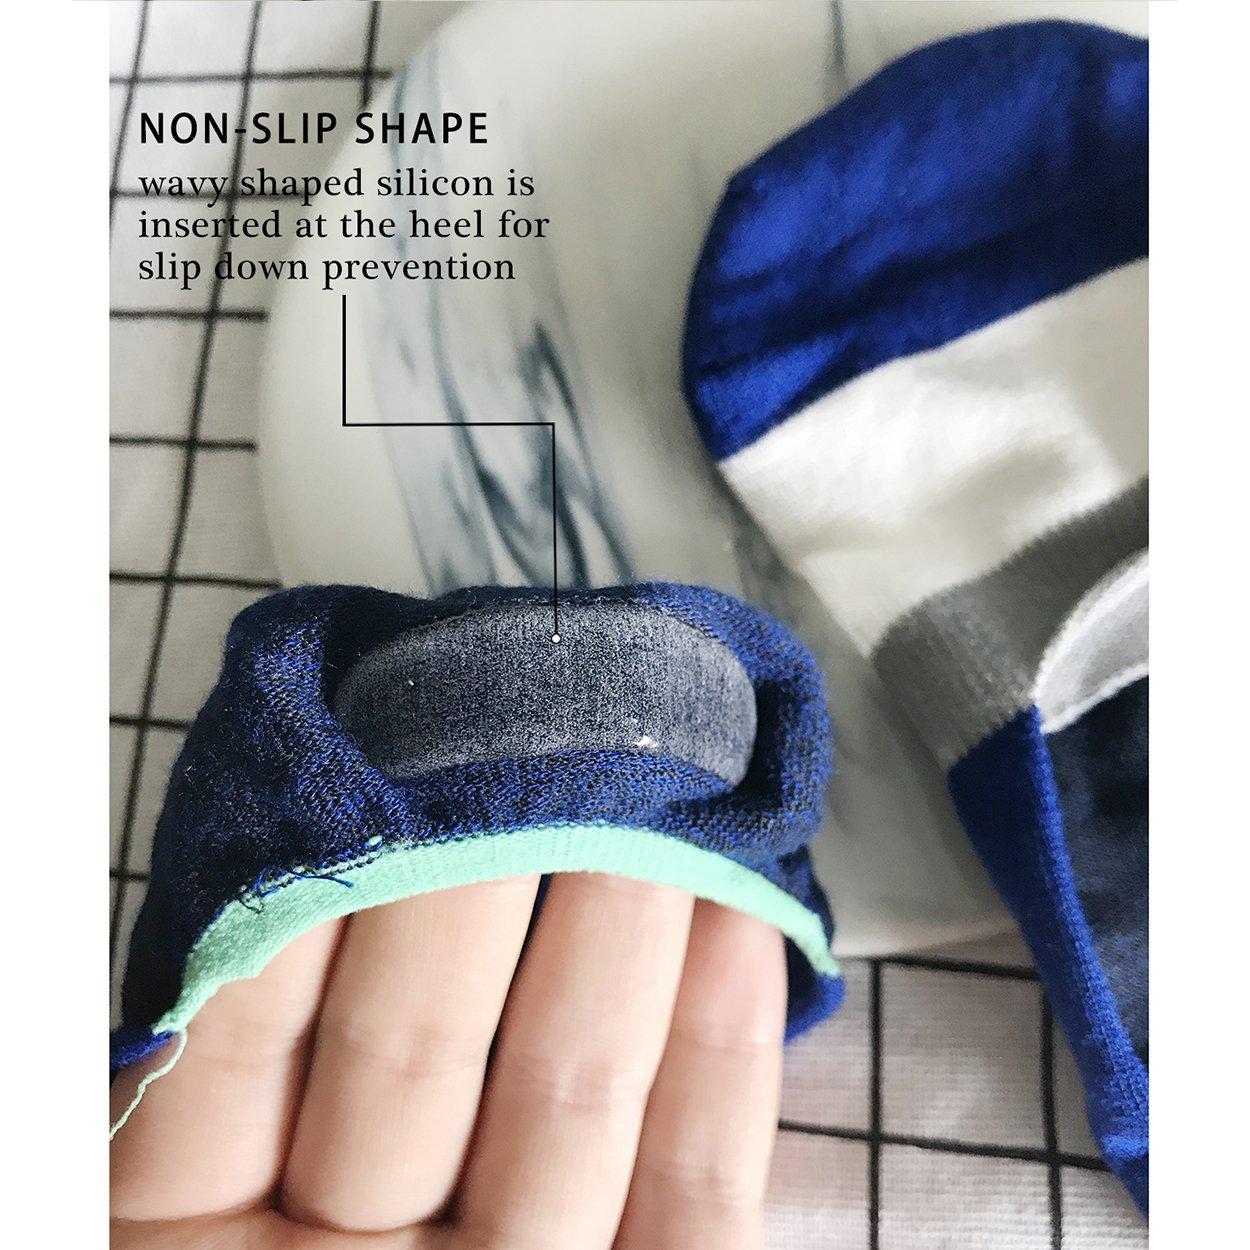 Mens 6 Pairs No Show Socks Cotton Non Slip Low Cut Invisible Socks Mesh Knit Black Green at Amazon Mens Clothing store: